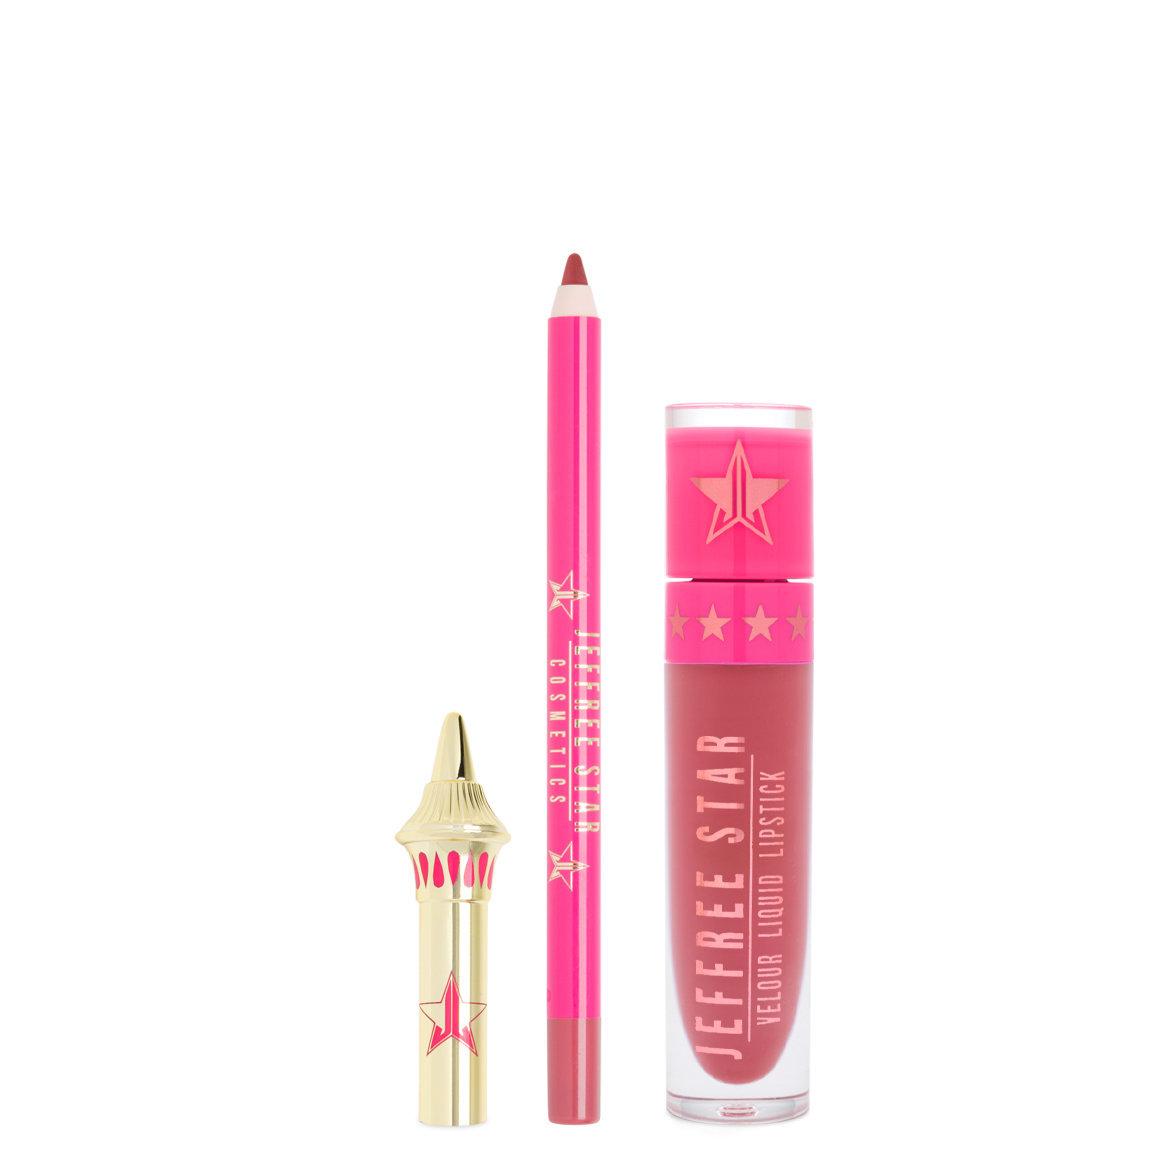 Jeffree Star Cosmetics Velour Lip Kit Calabasas